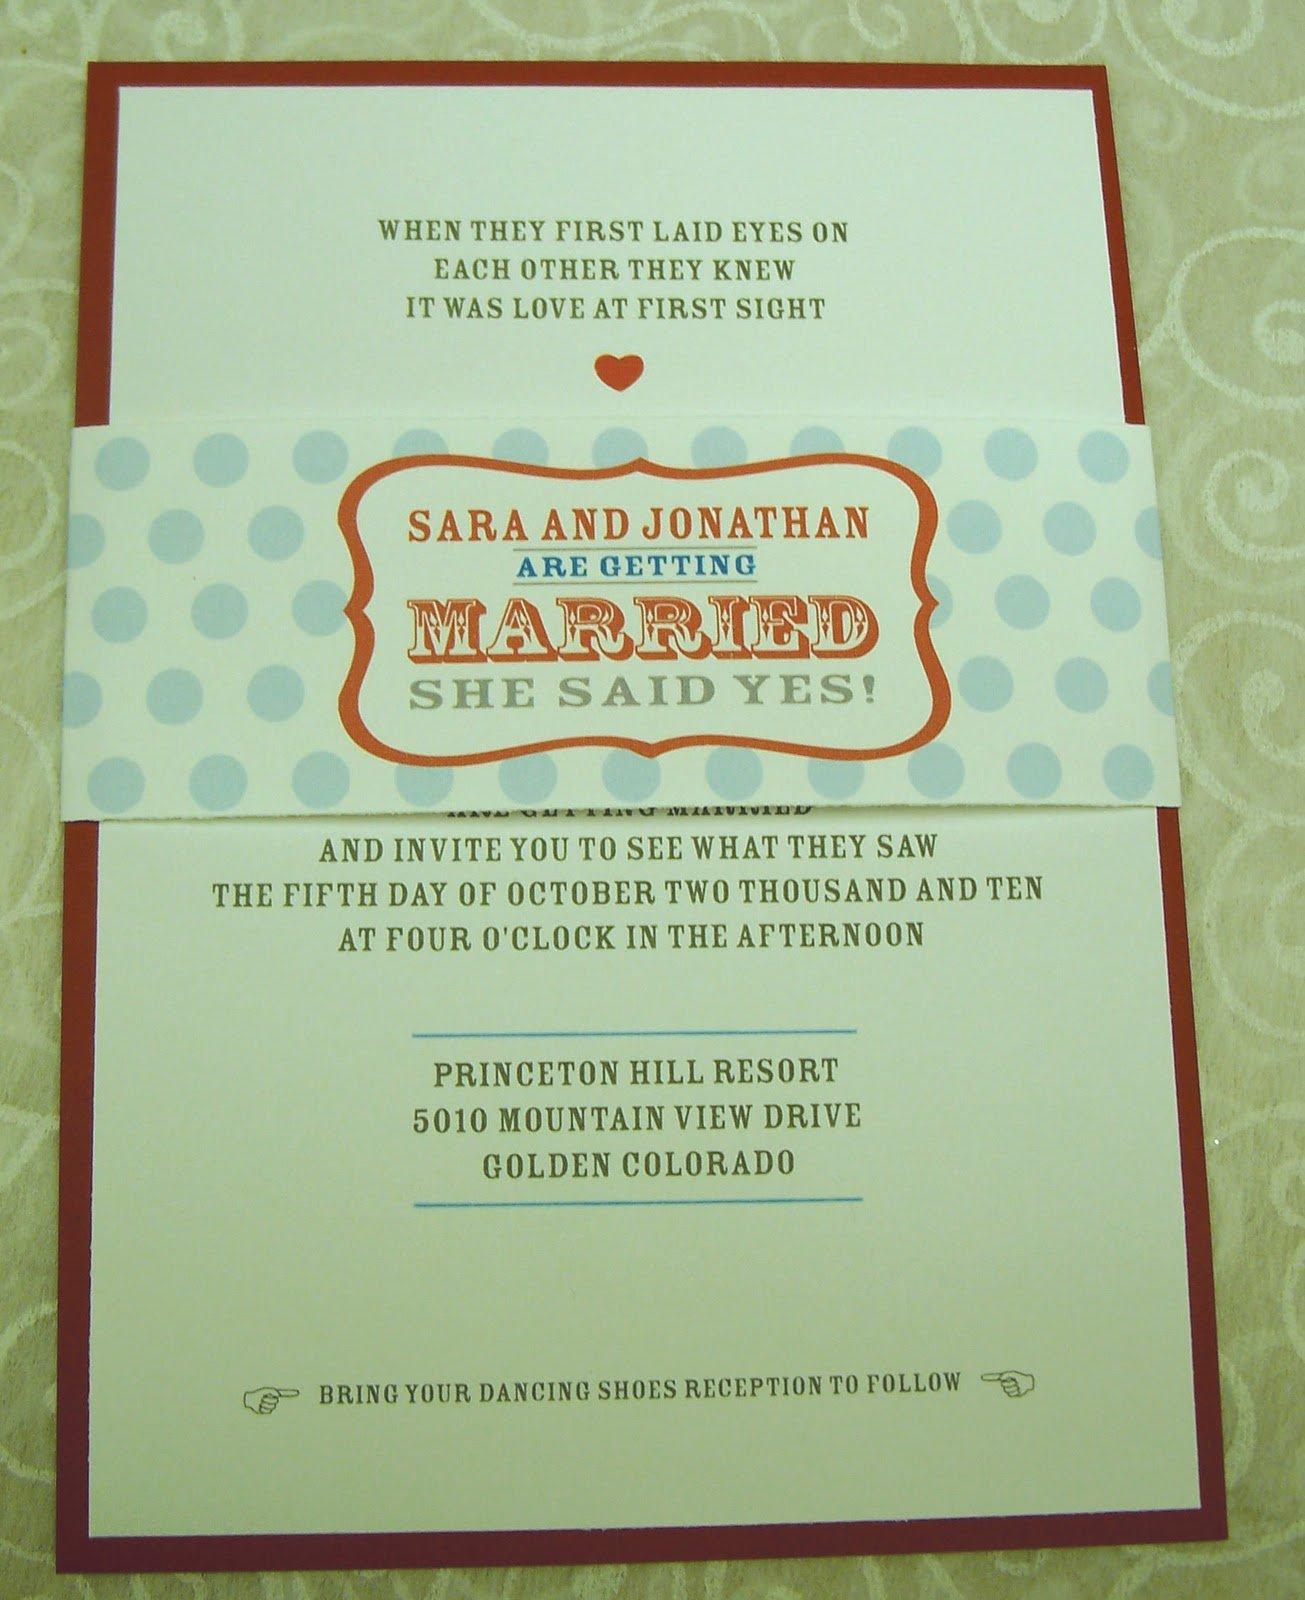 Harry Potter Wedding Invitation Wording